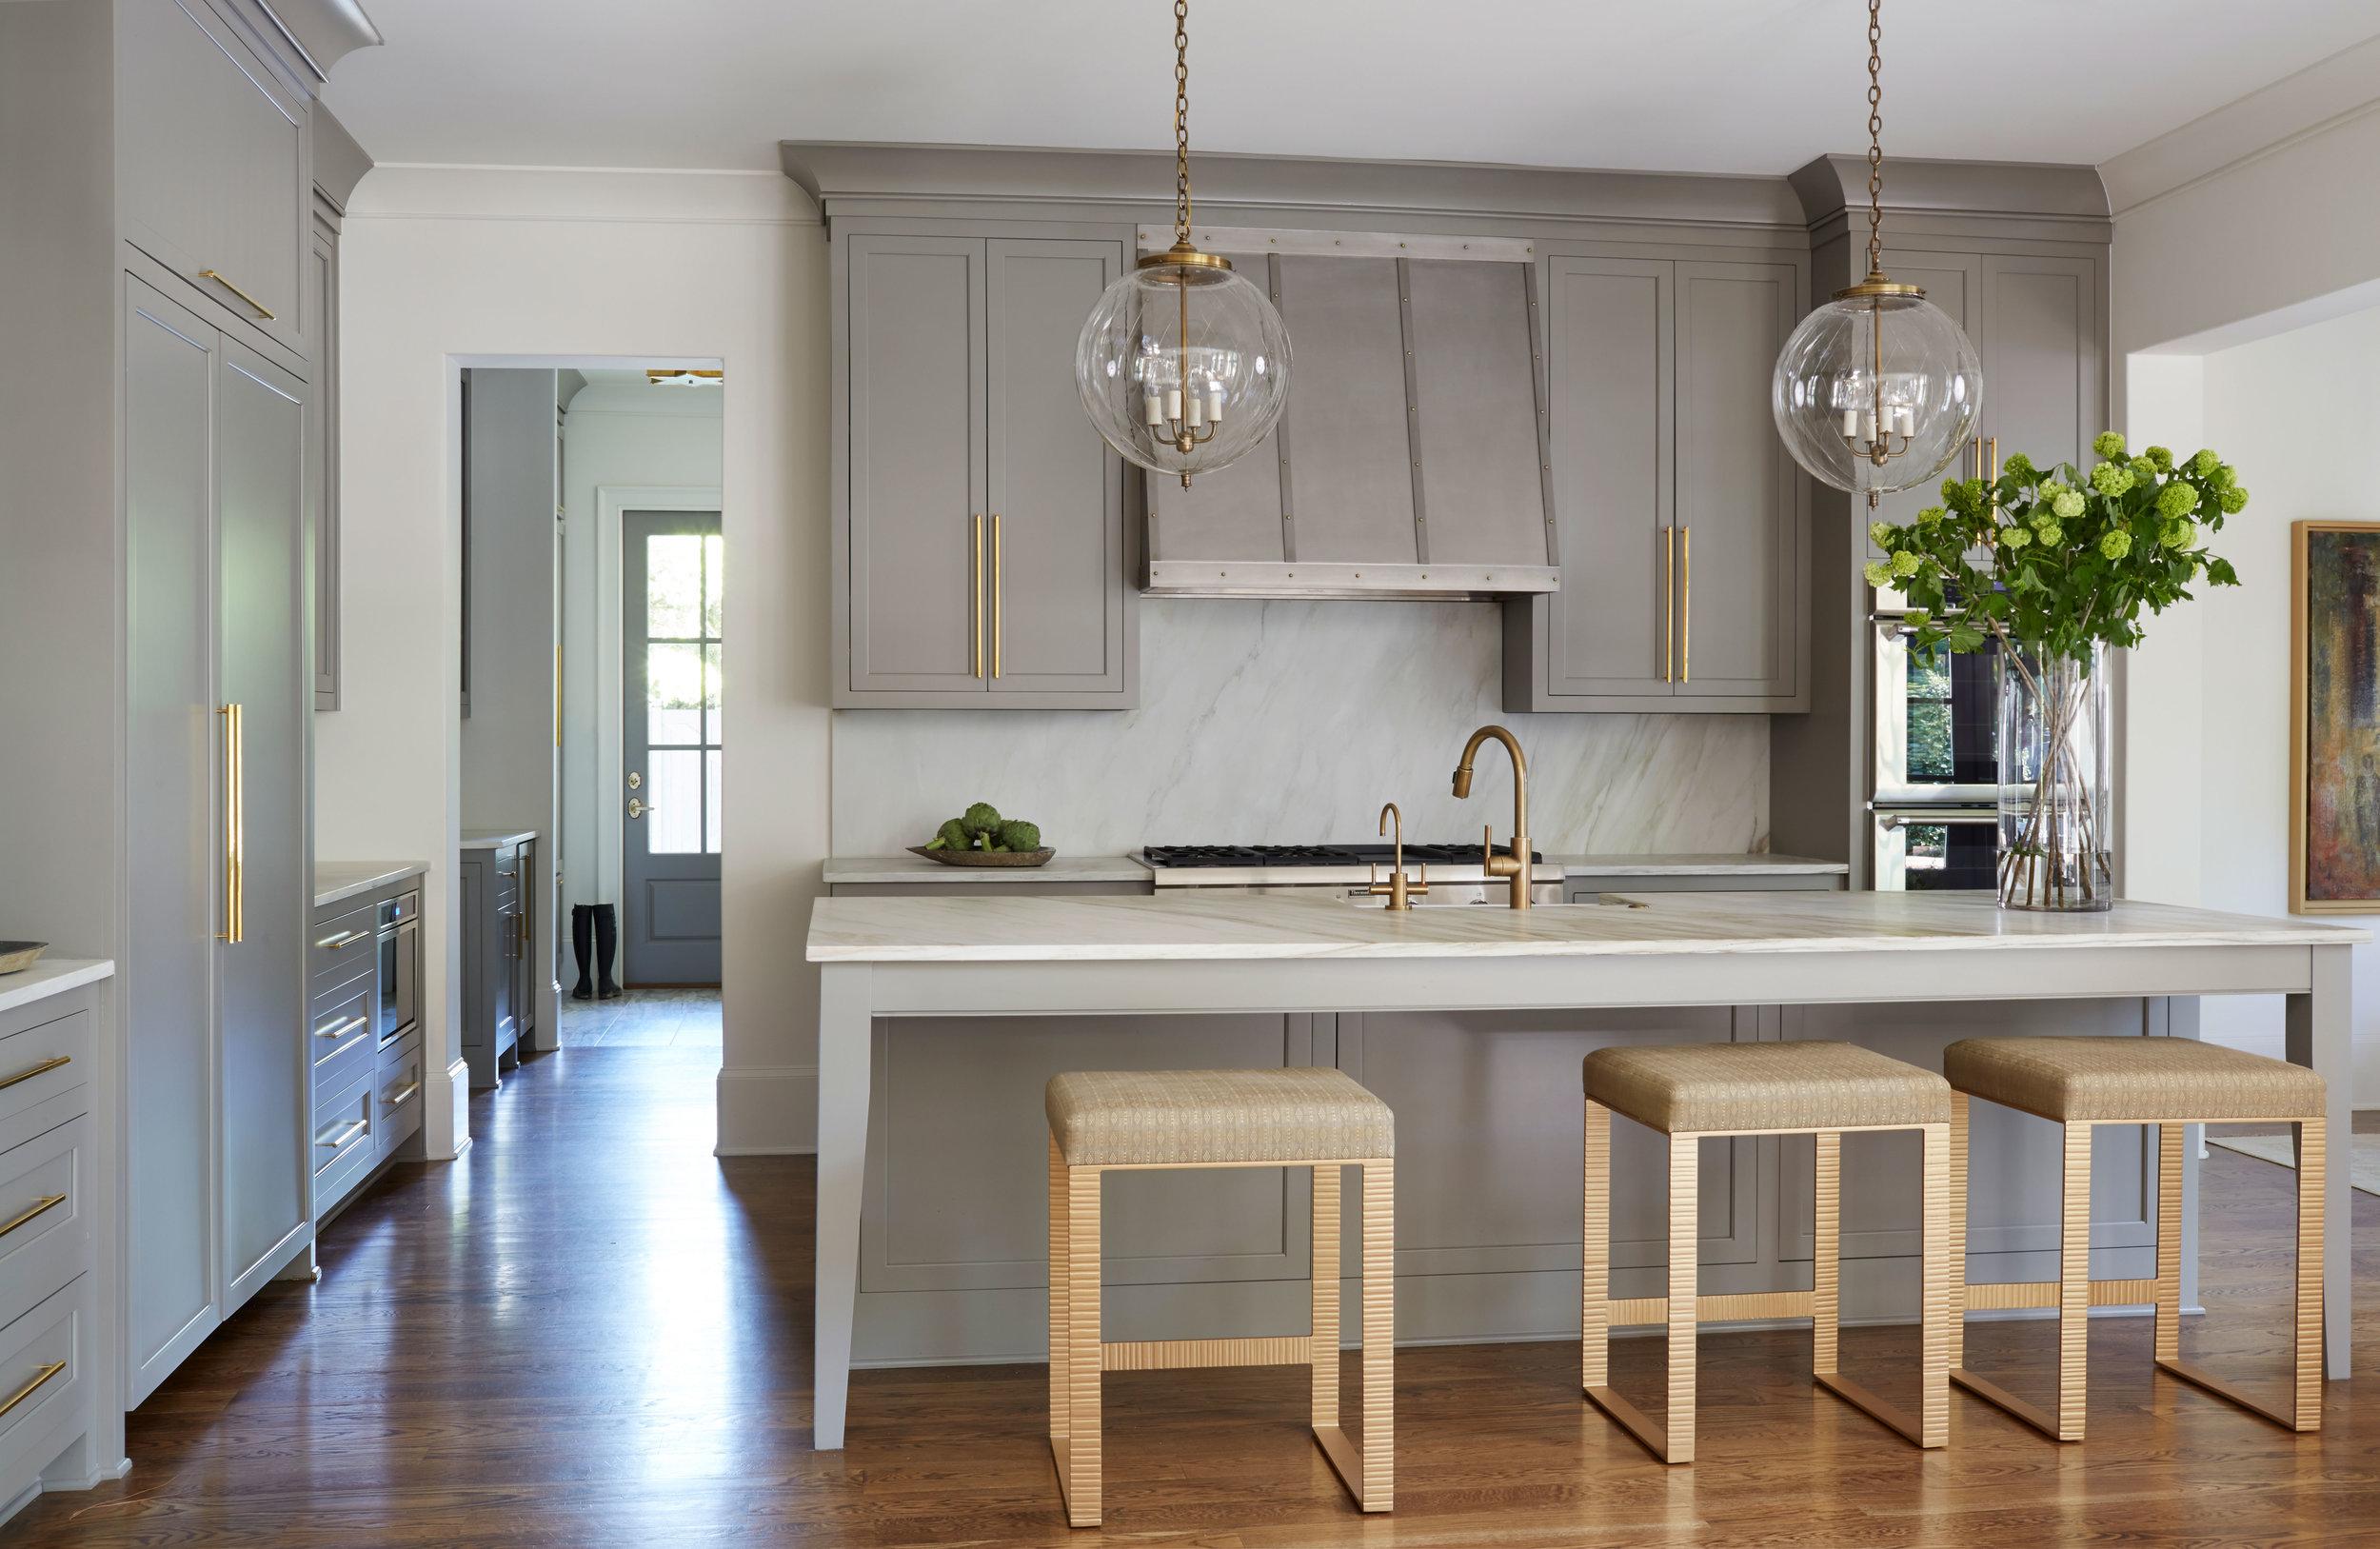 Kitchens5.jpg